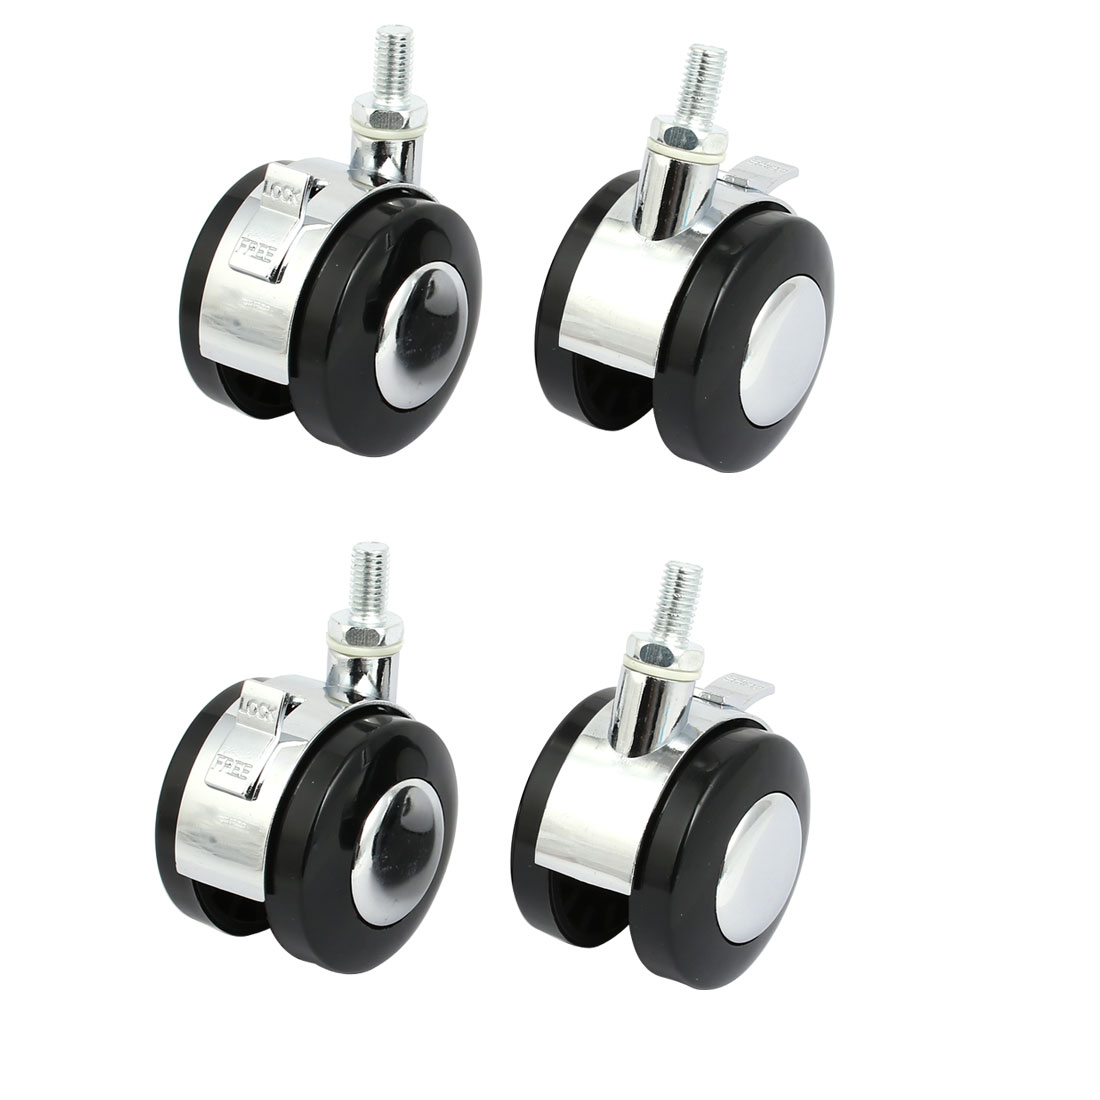 M8 Thread 2-inch Dia Wheel Swivel Brake Caster Roller 4pcs